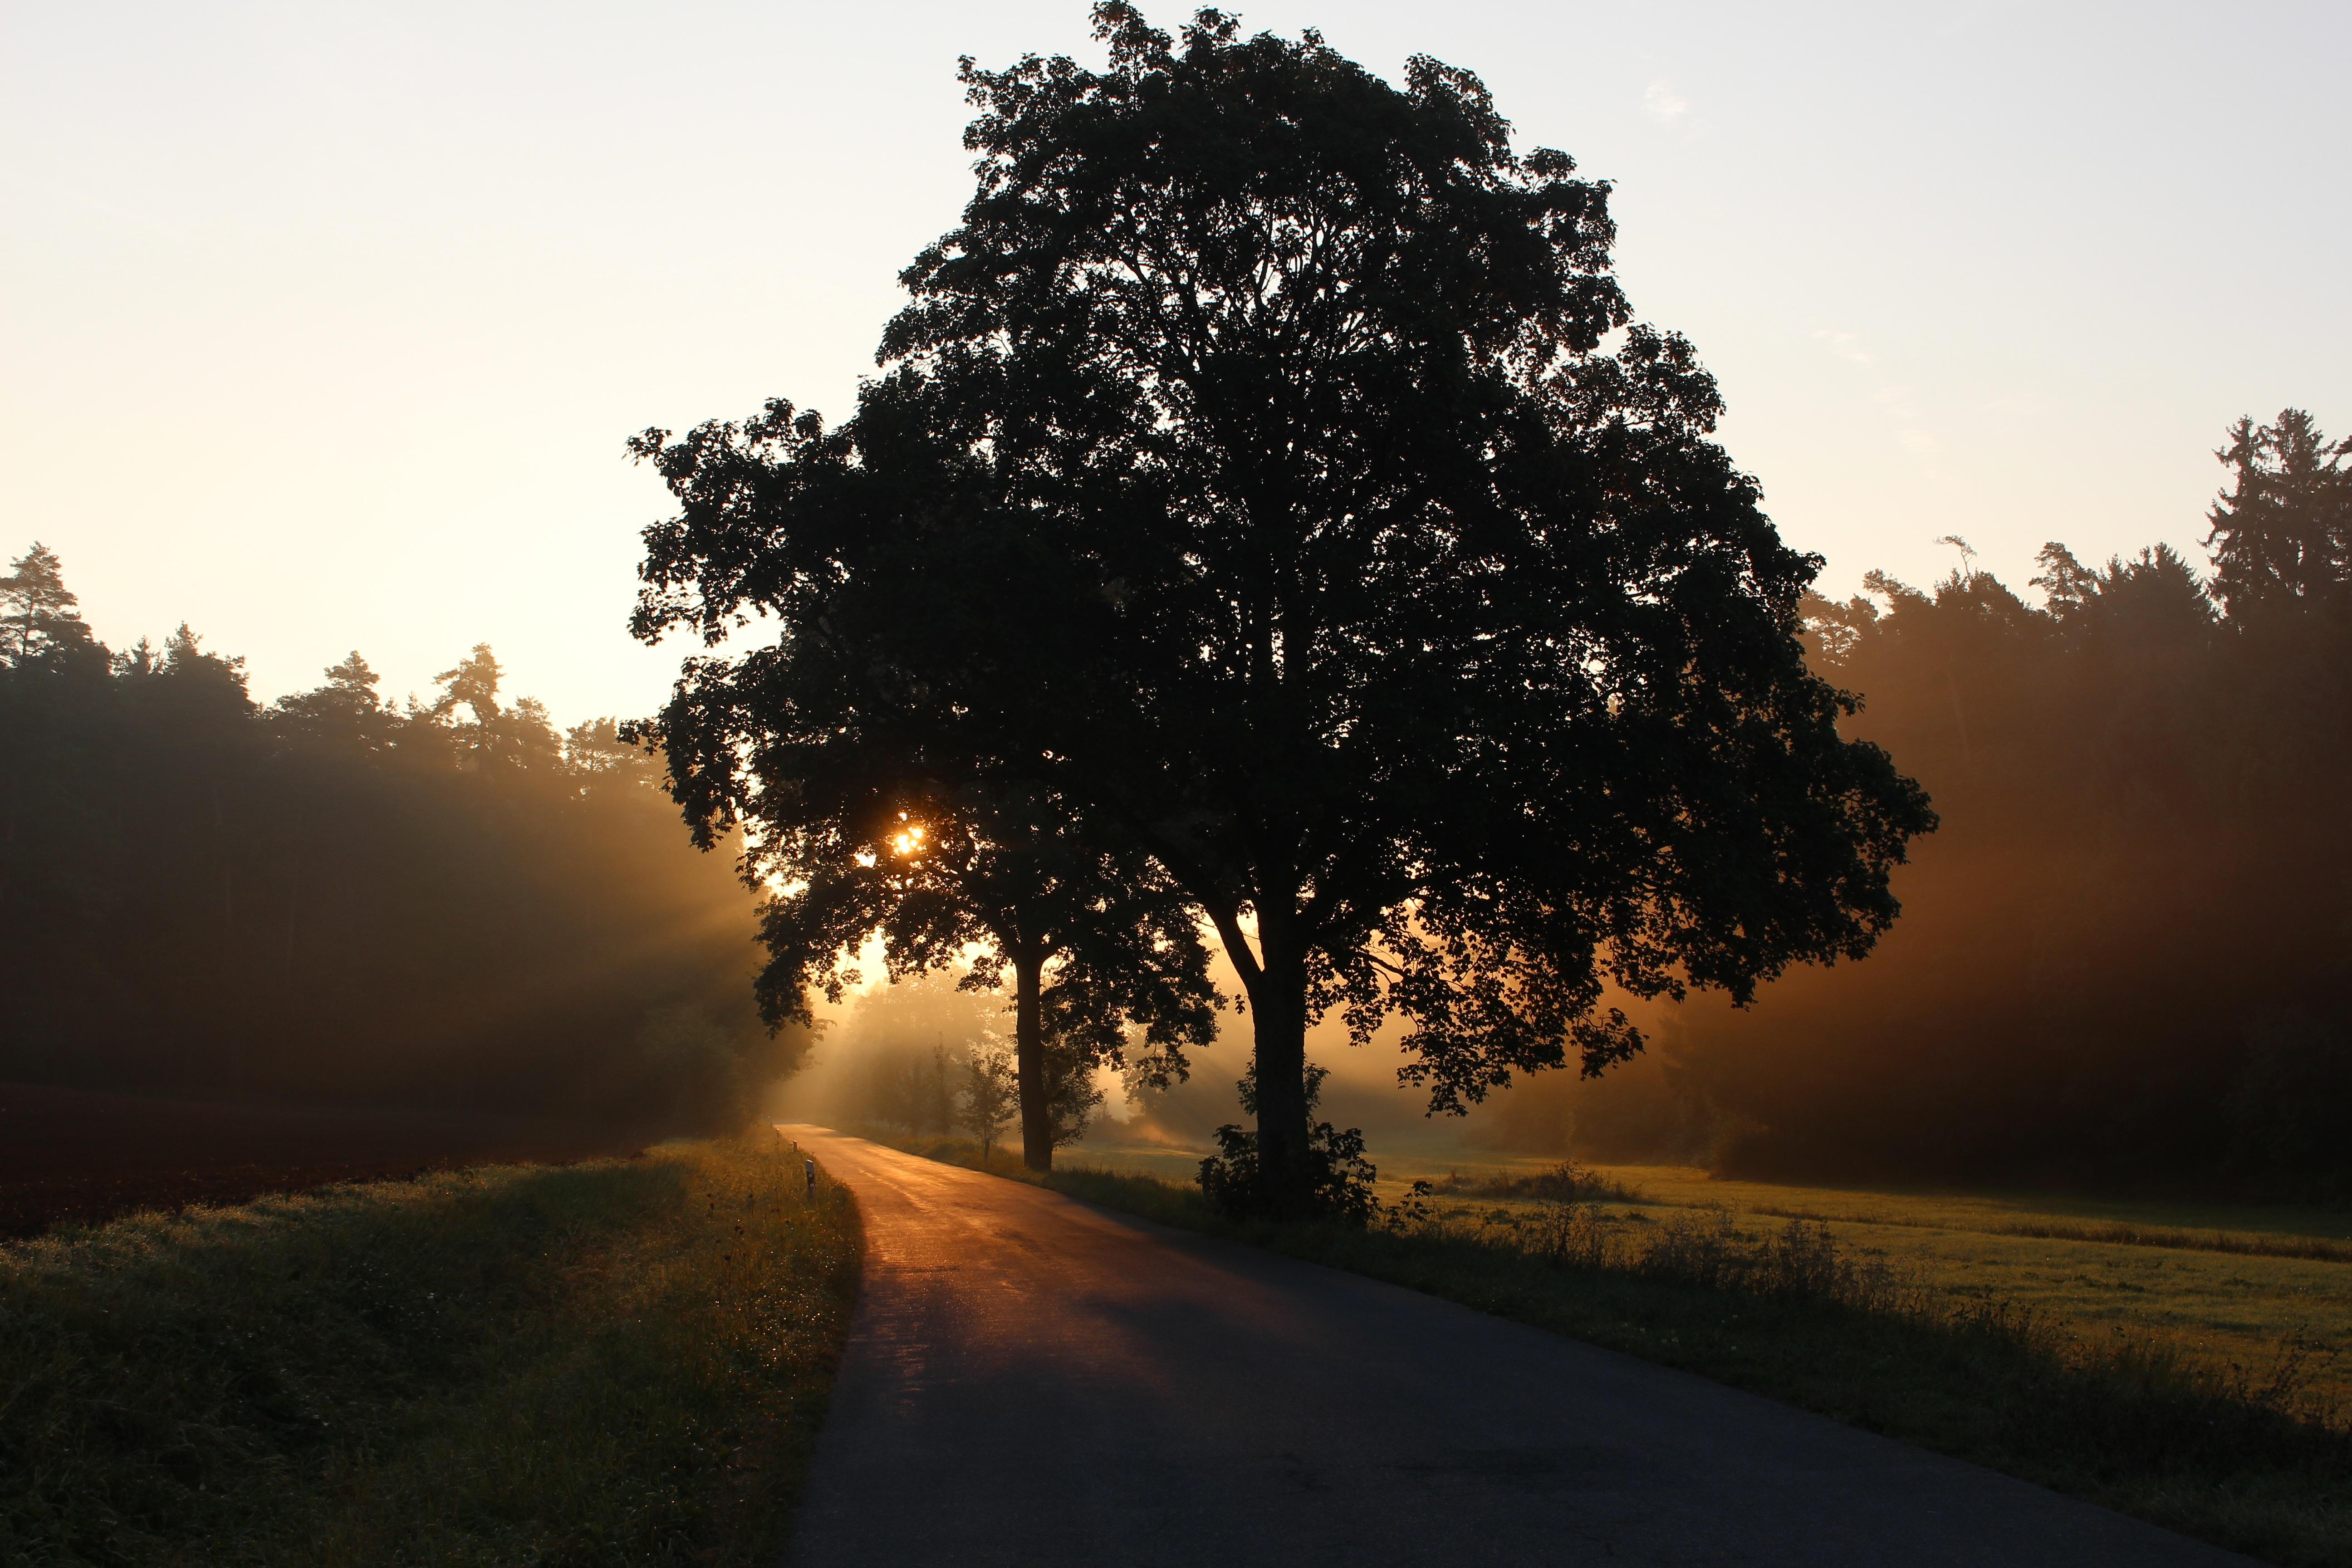 sun fog sunrise trees - photo #12